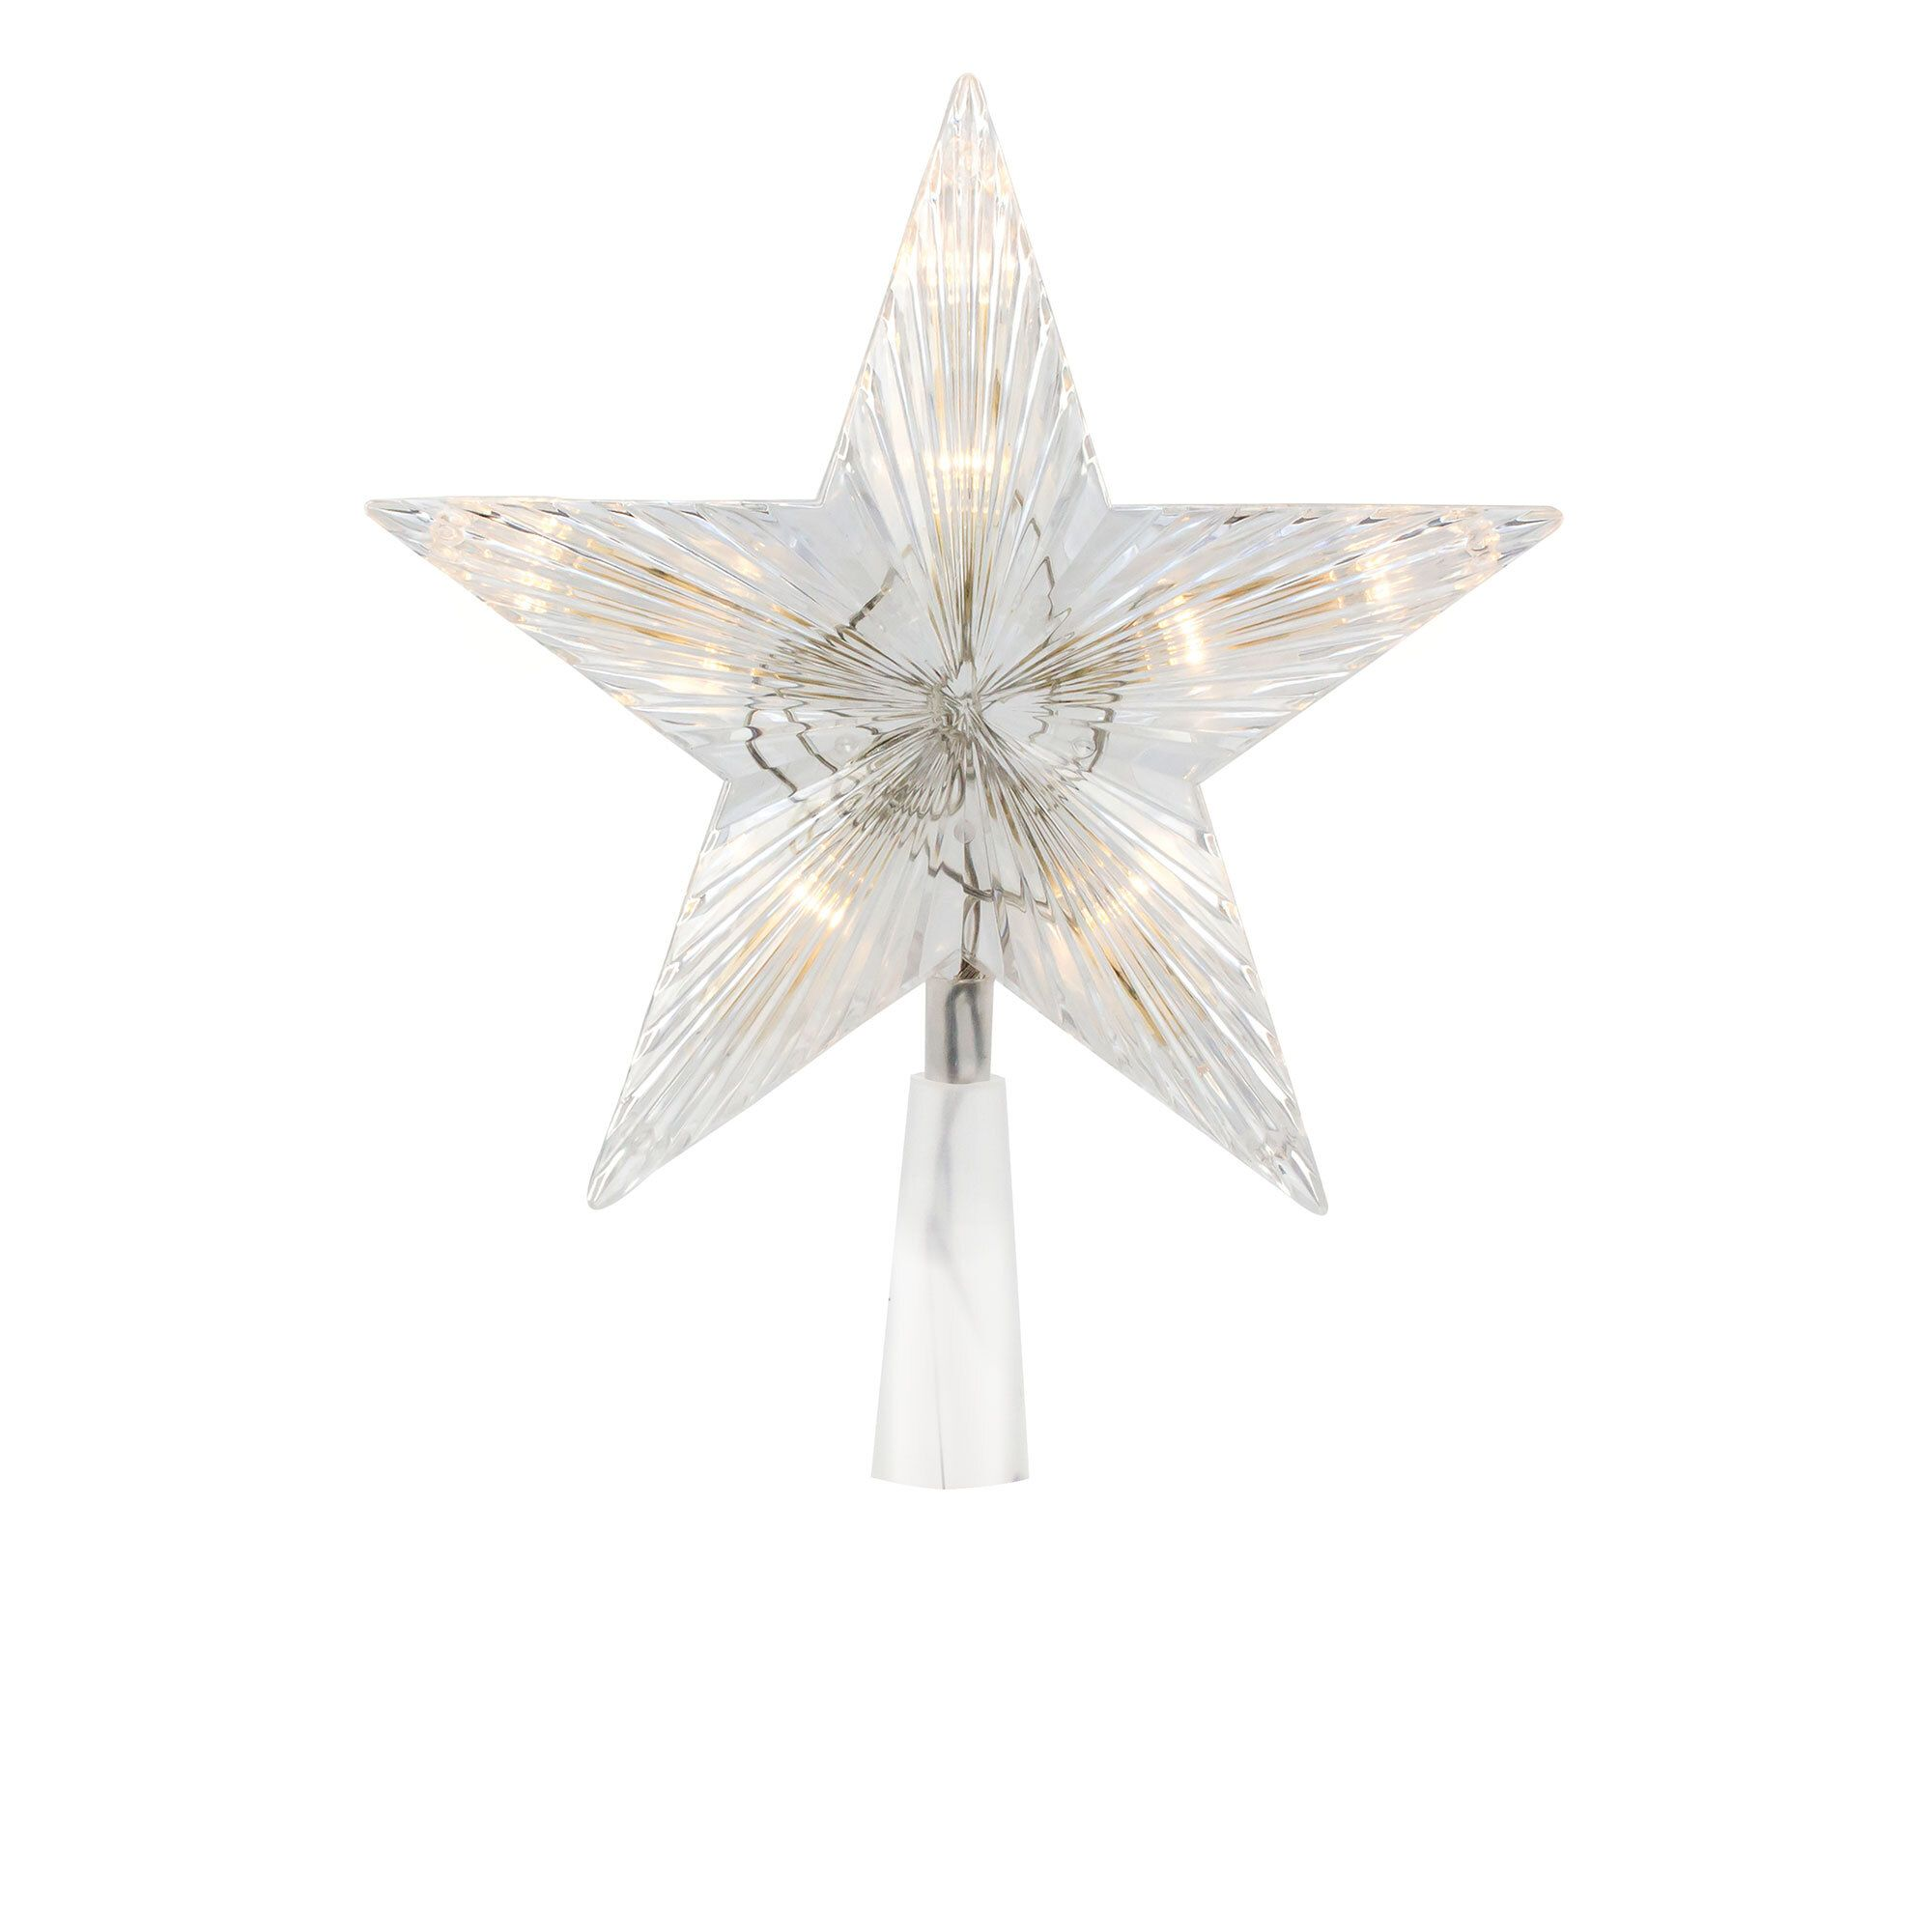 Punta_decorativa_stella_Albero_Natale